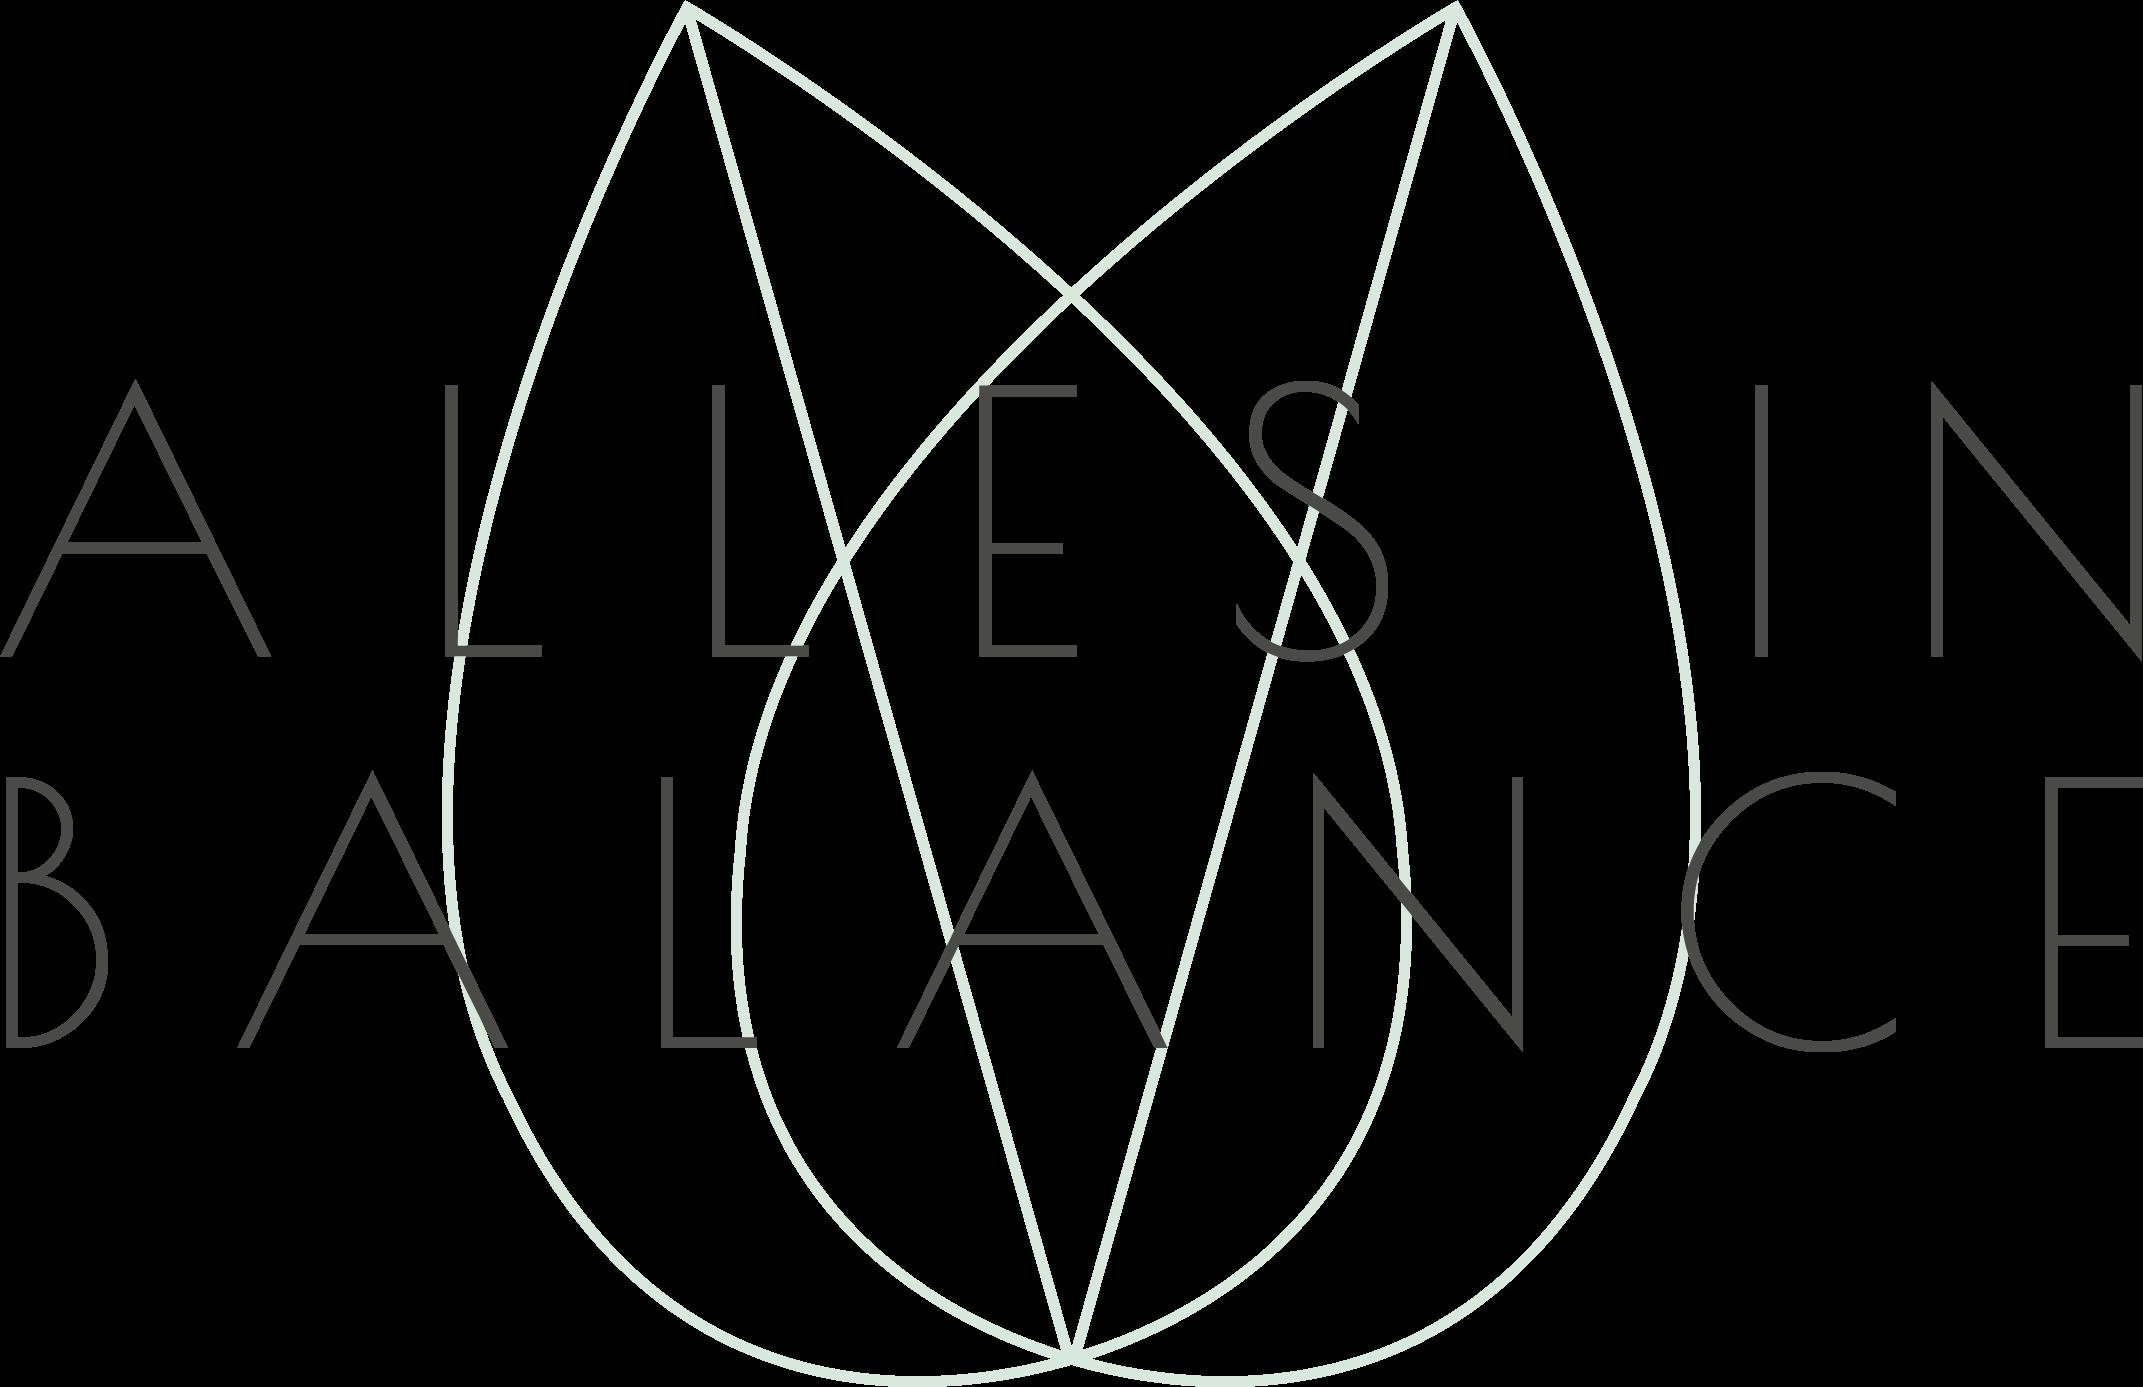 Alles_In_Balance_Logo_webseite